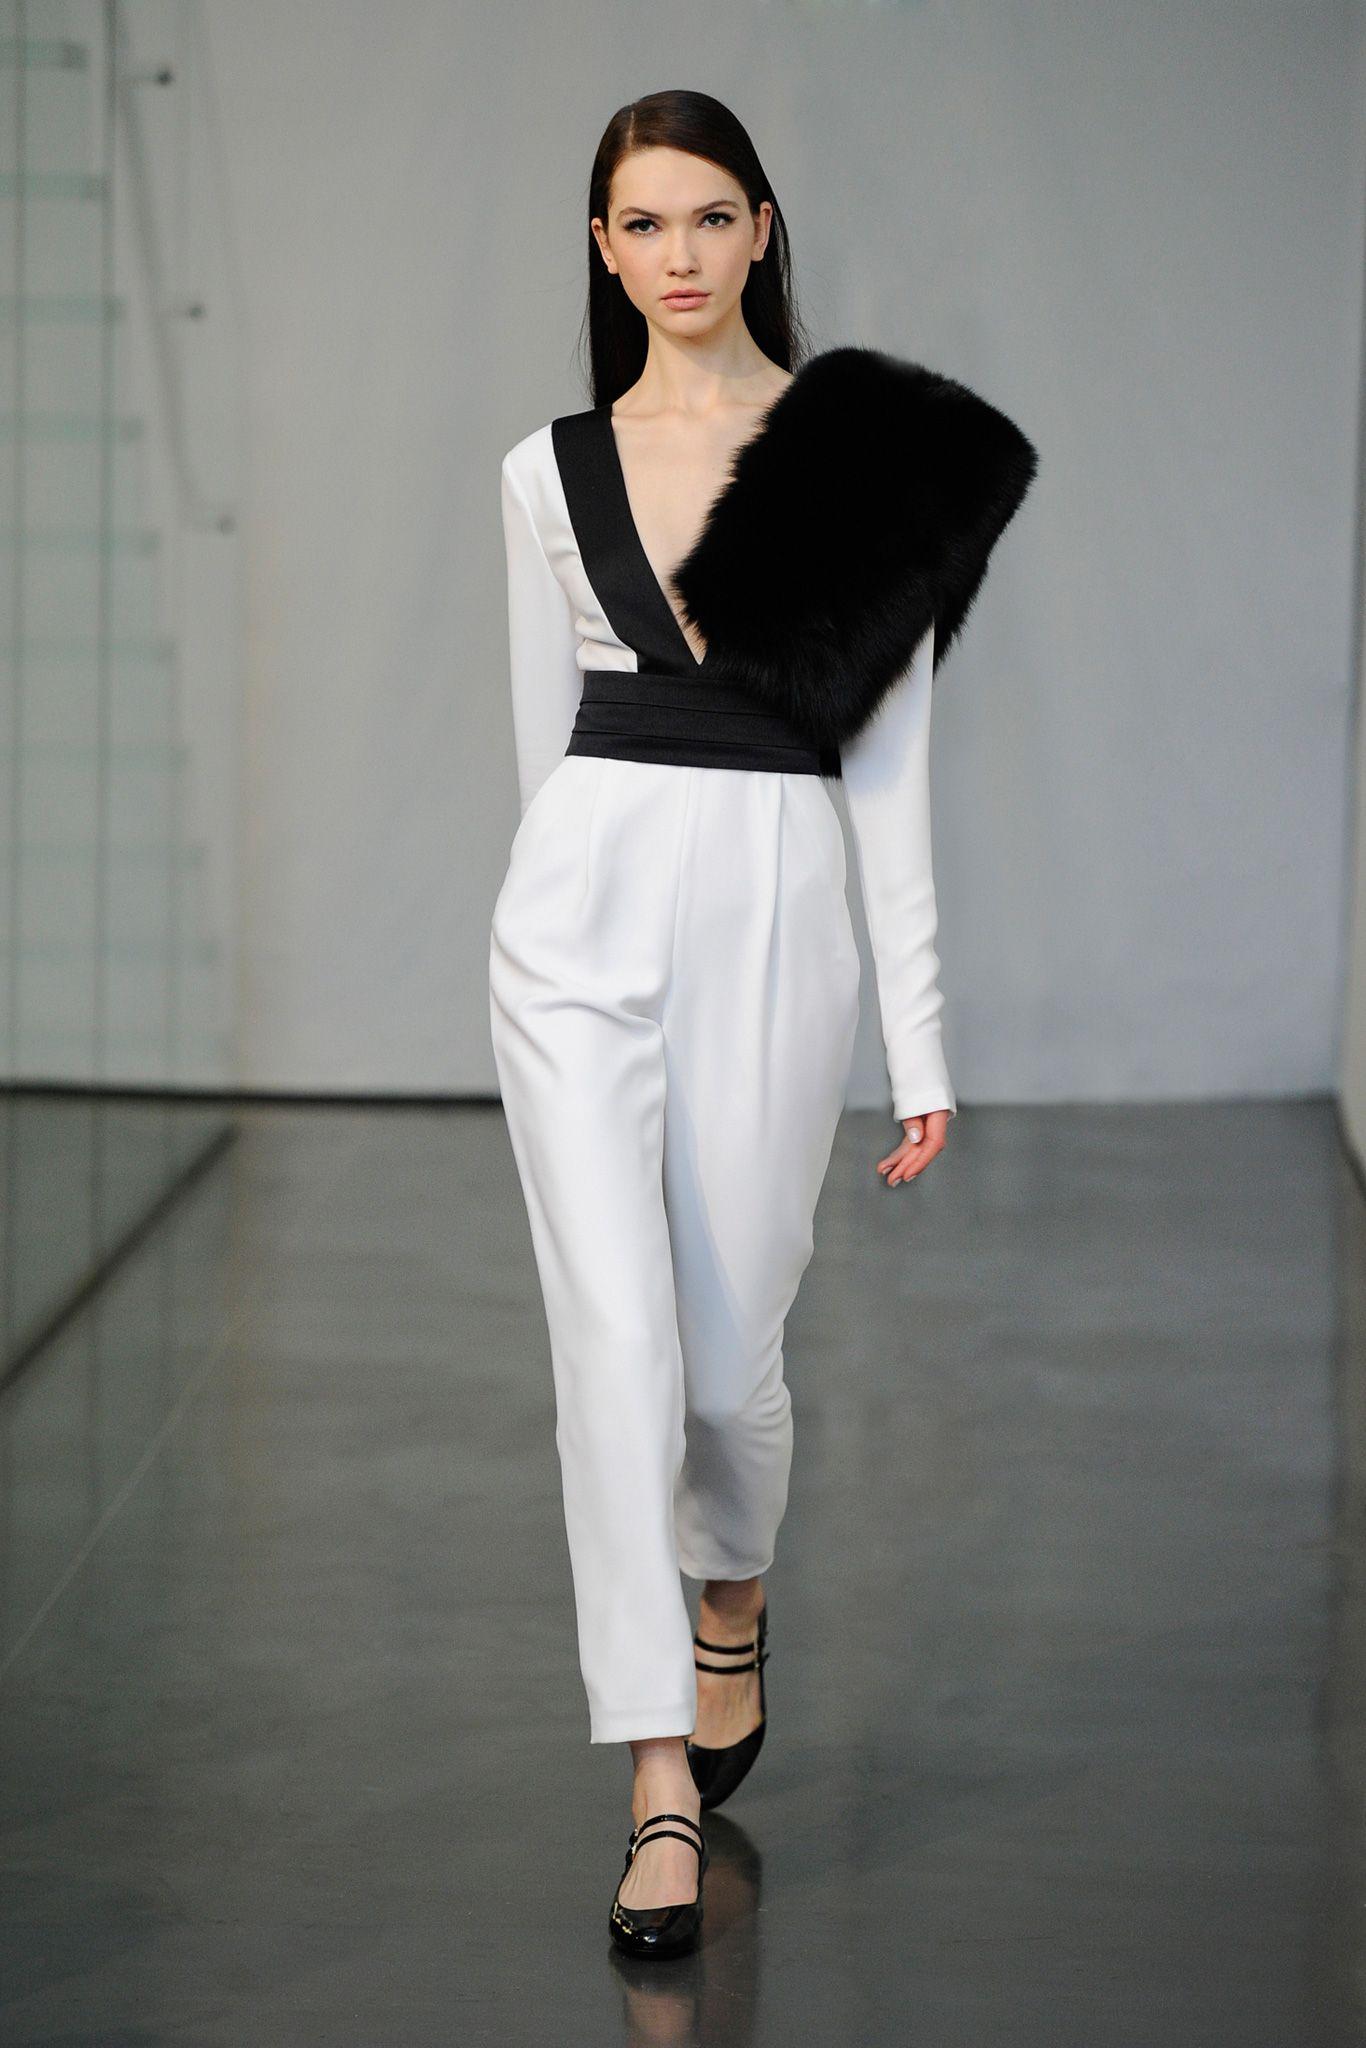 Rachel Zoe - Fall 2015 Ready-to-Wear - #NEB #noiretblancconcept #blackandwhite #fashion #style #designer #nw #fall2015 #fashionweek #runway #models #black #white